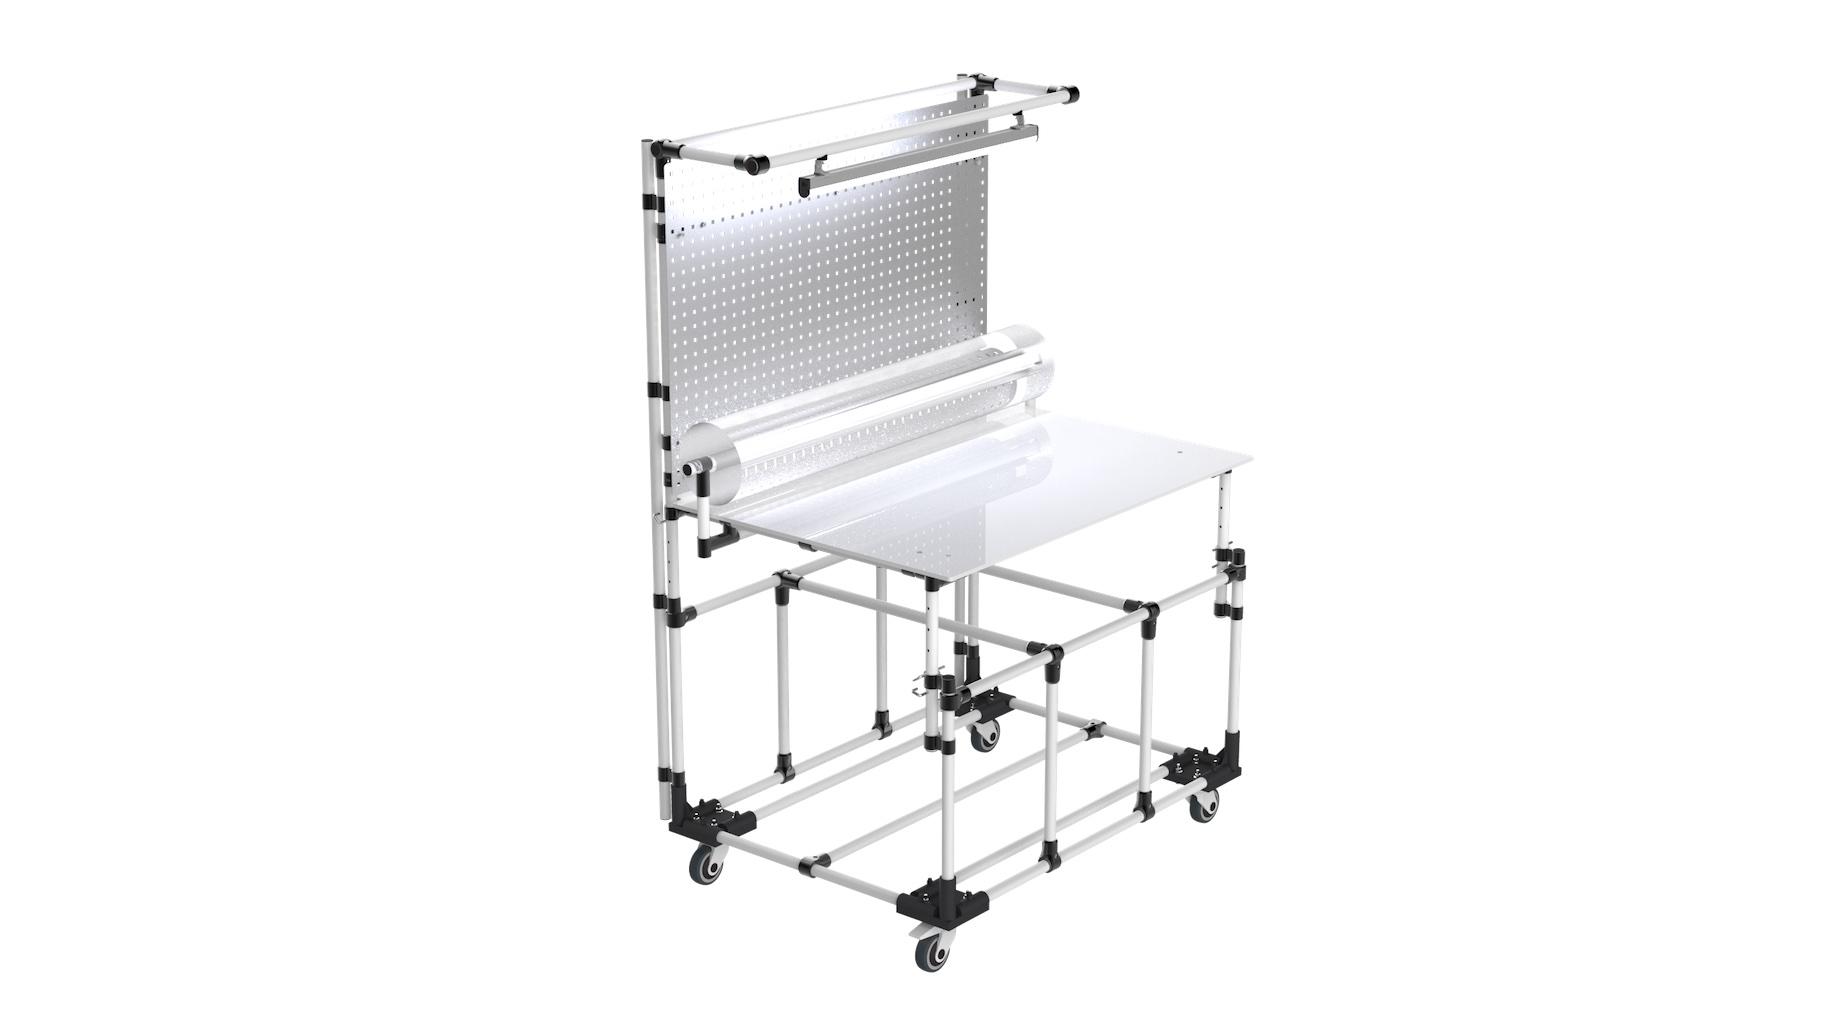 Logistics - Bespoke mobile workbench for order preparation.